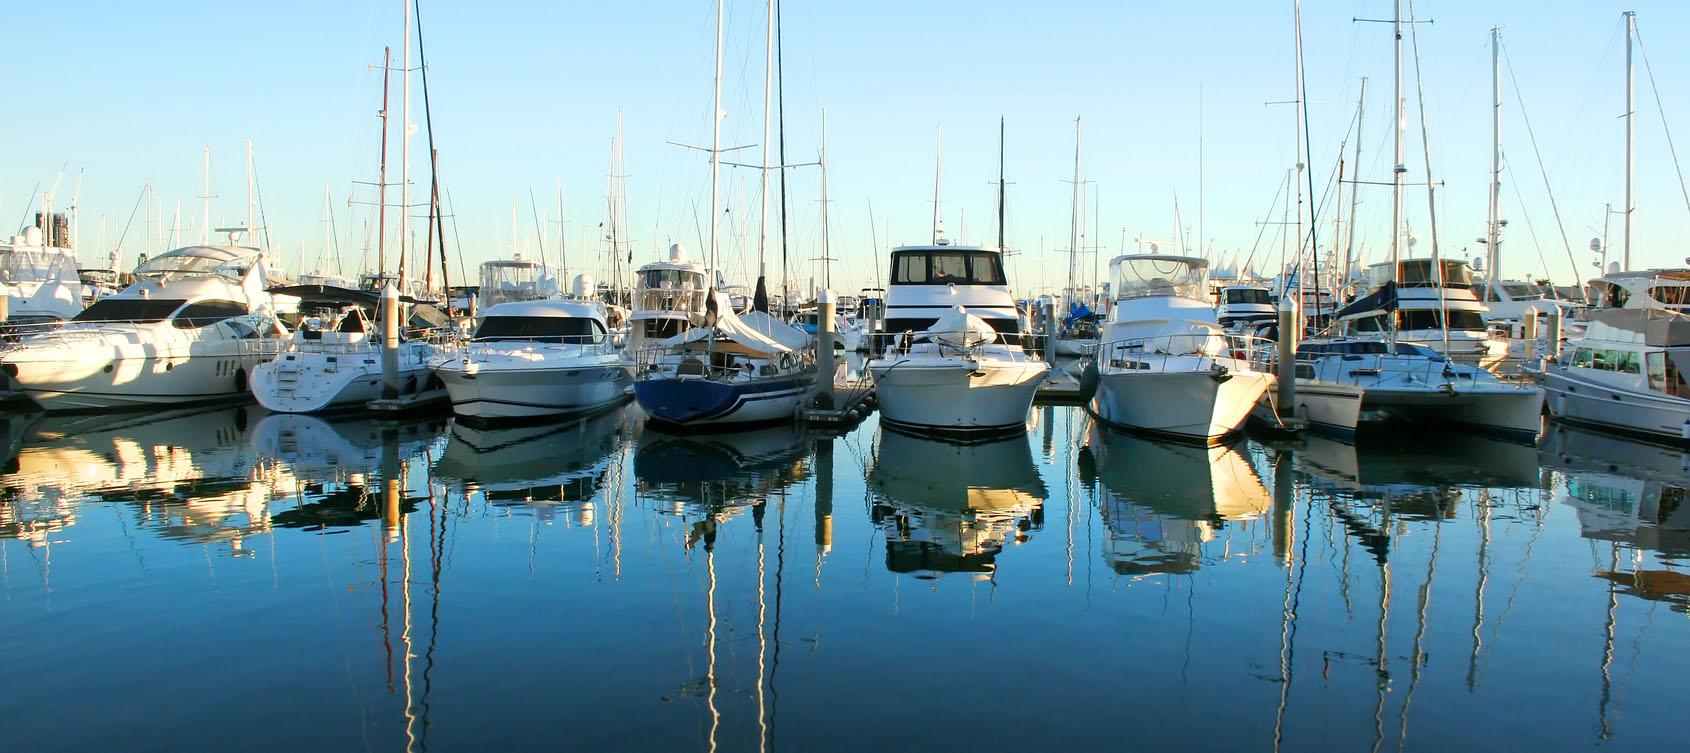 boats-in-marina.jpg